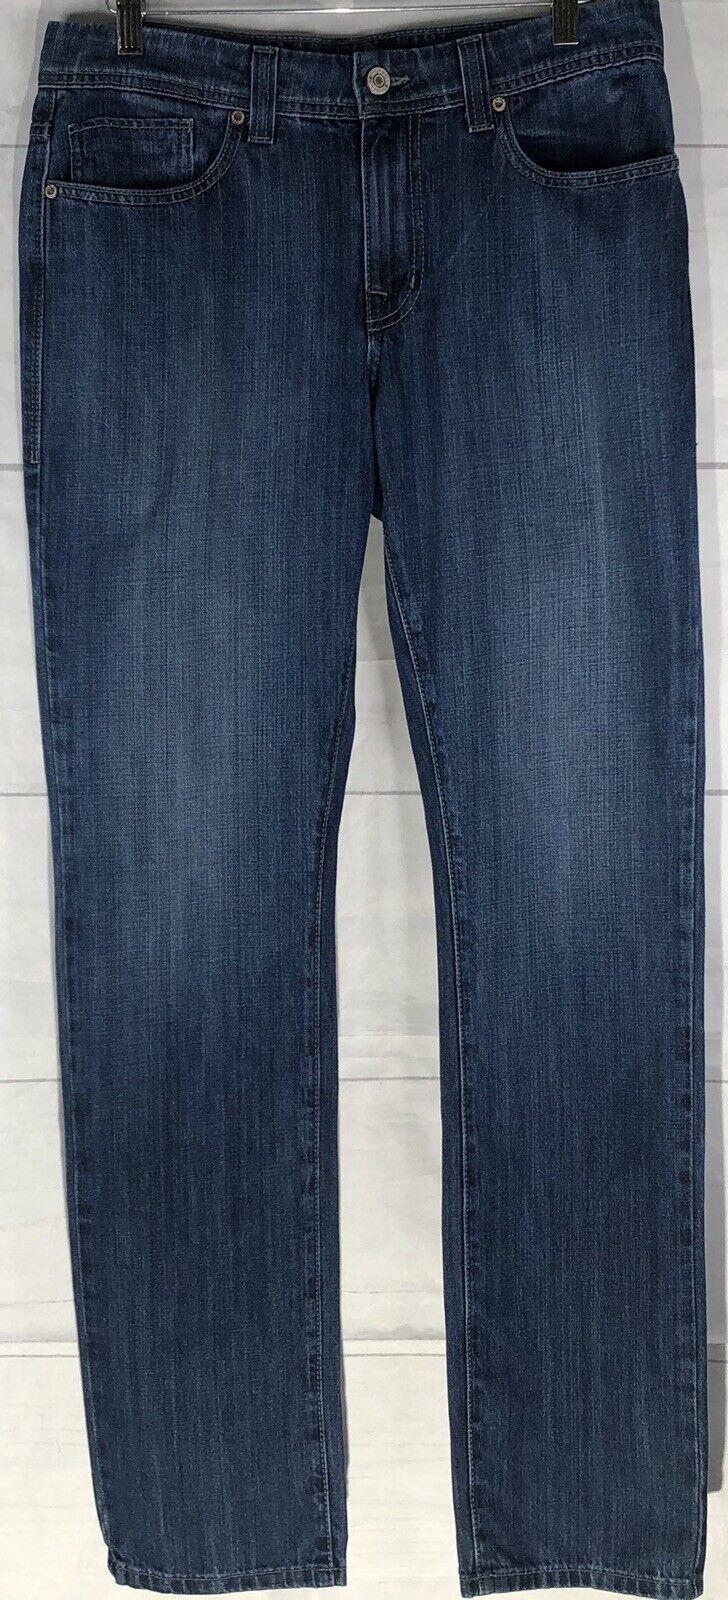 Fidelity Denim Mens Jeans  W30 Jimmy Slim  color Wiston Made in USA NEW nwot